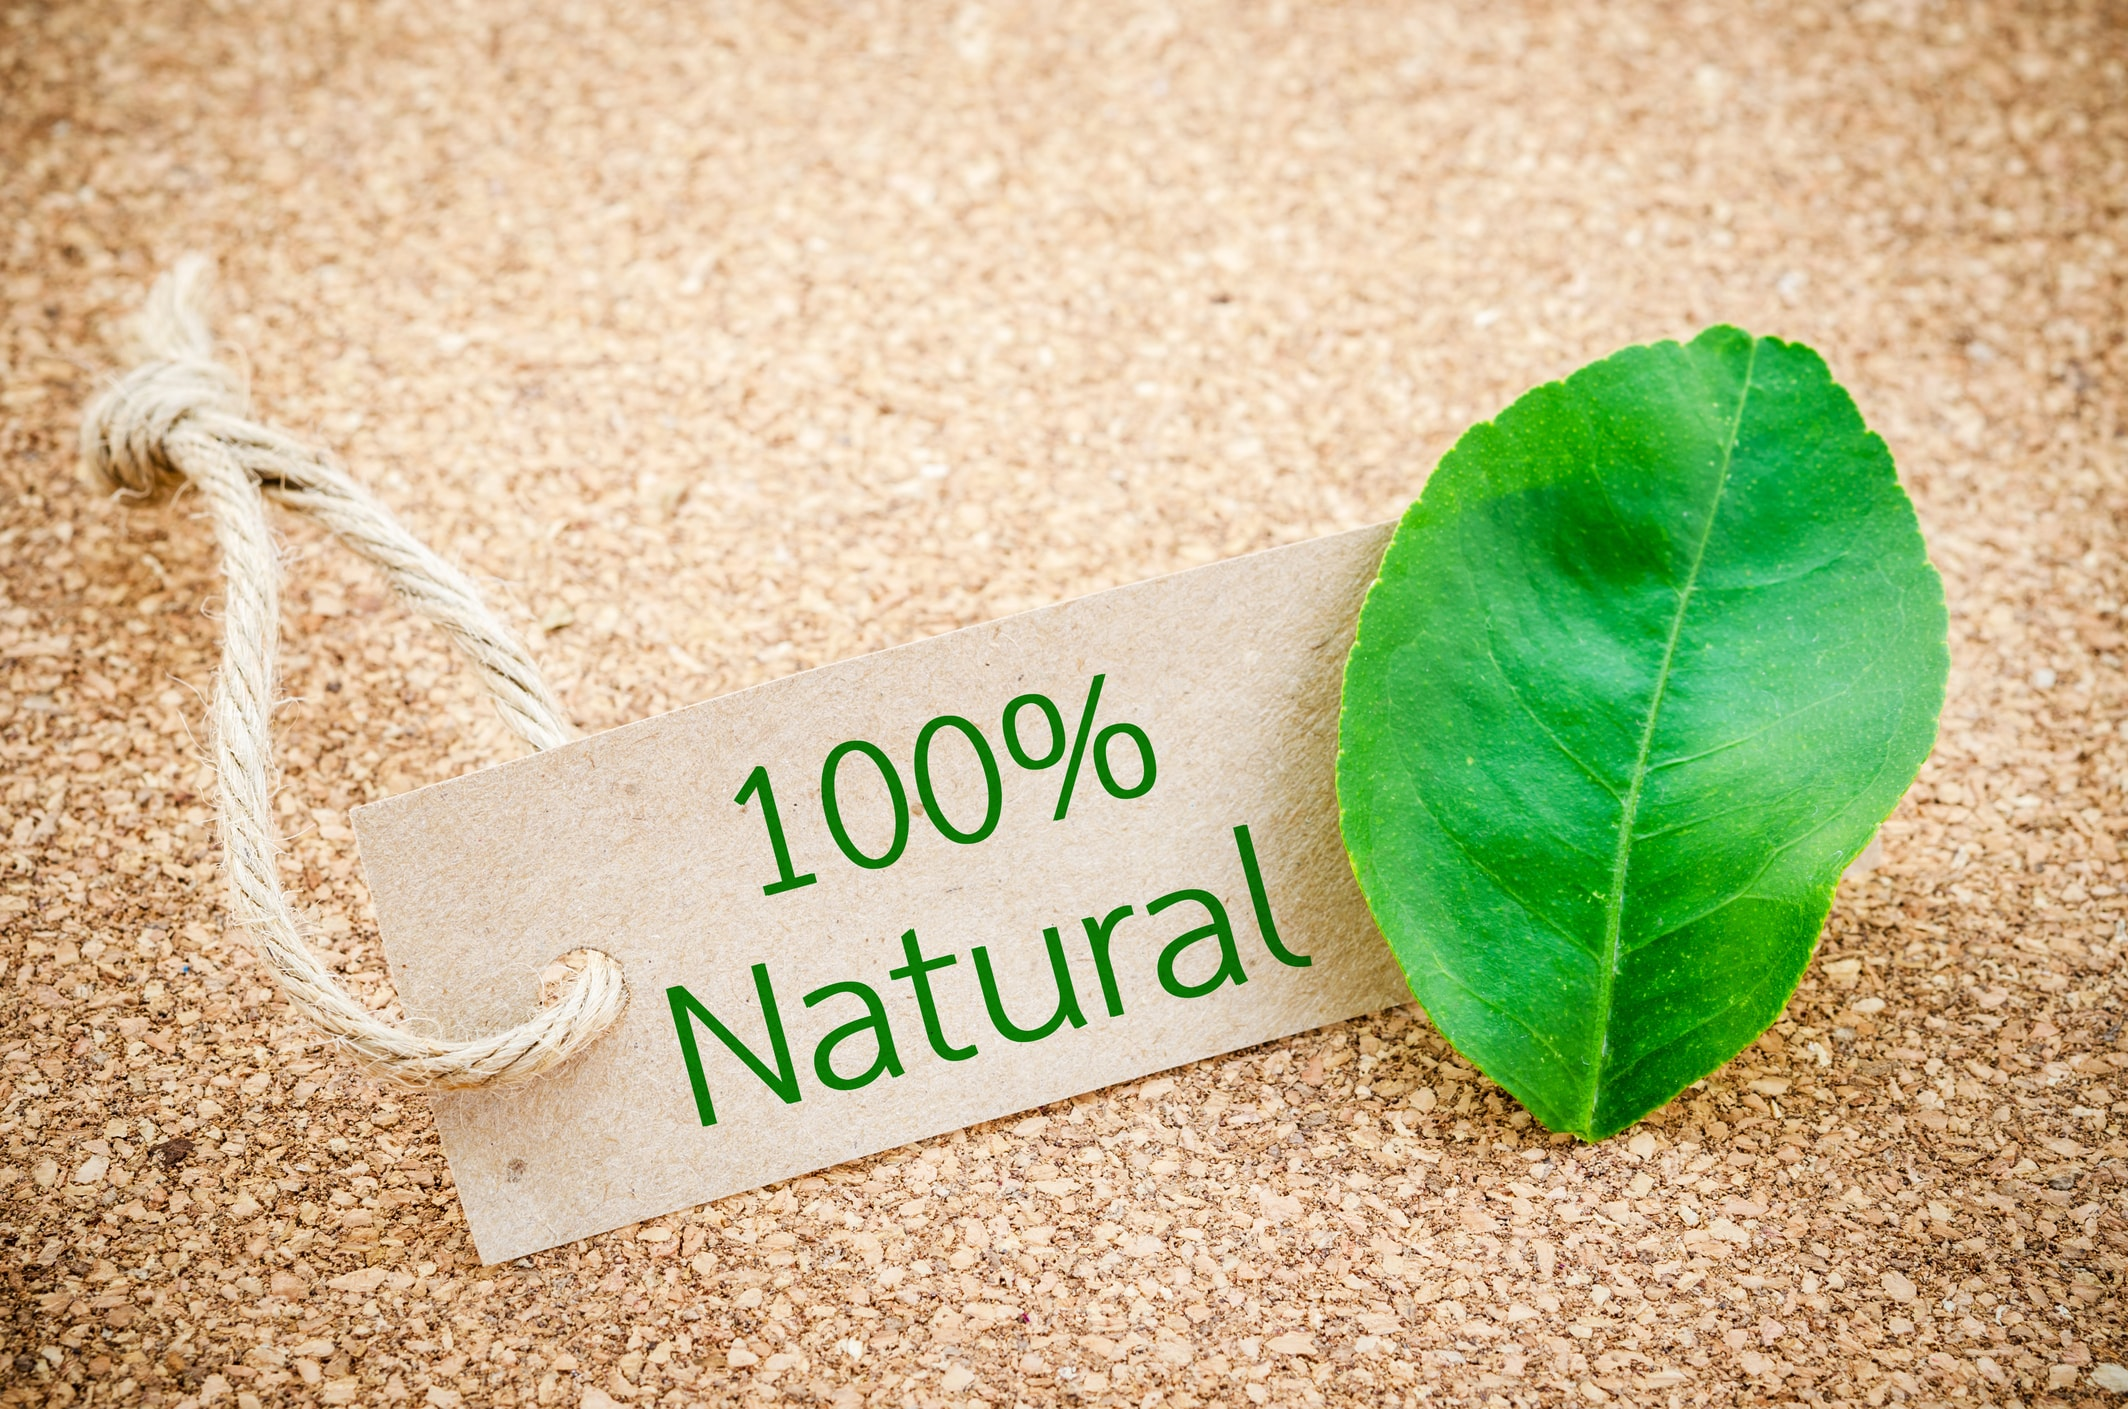 Bioprodukt 100% Natural